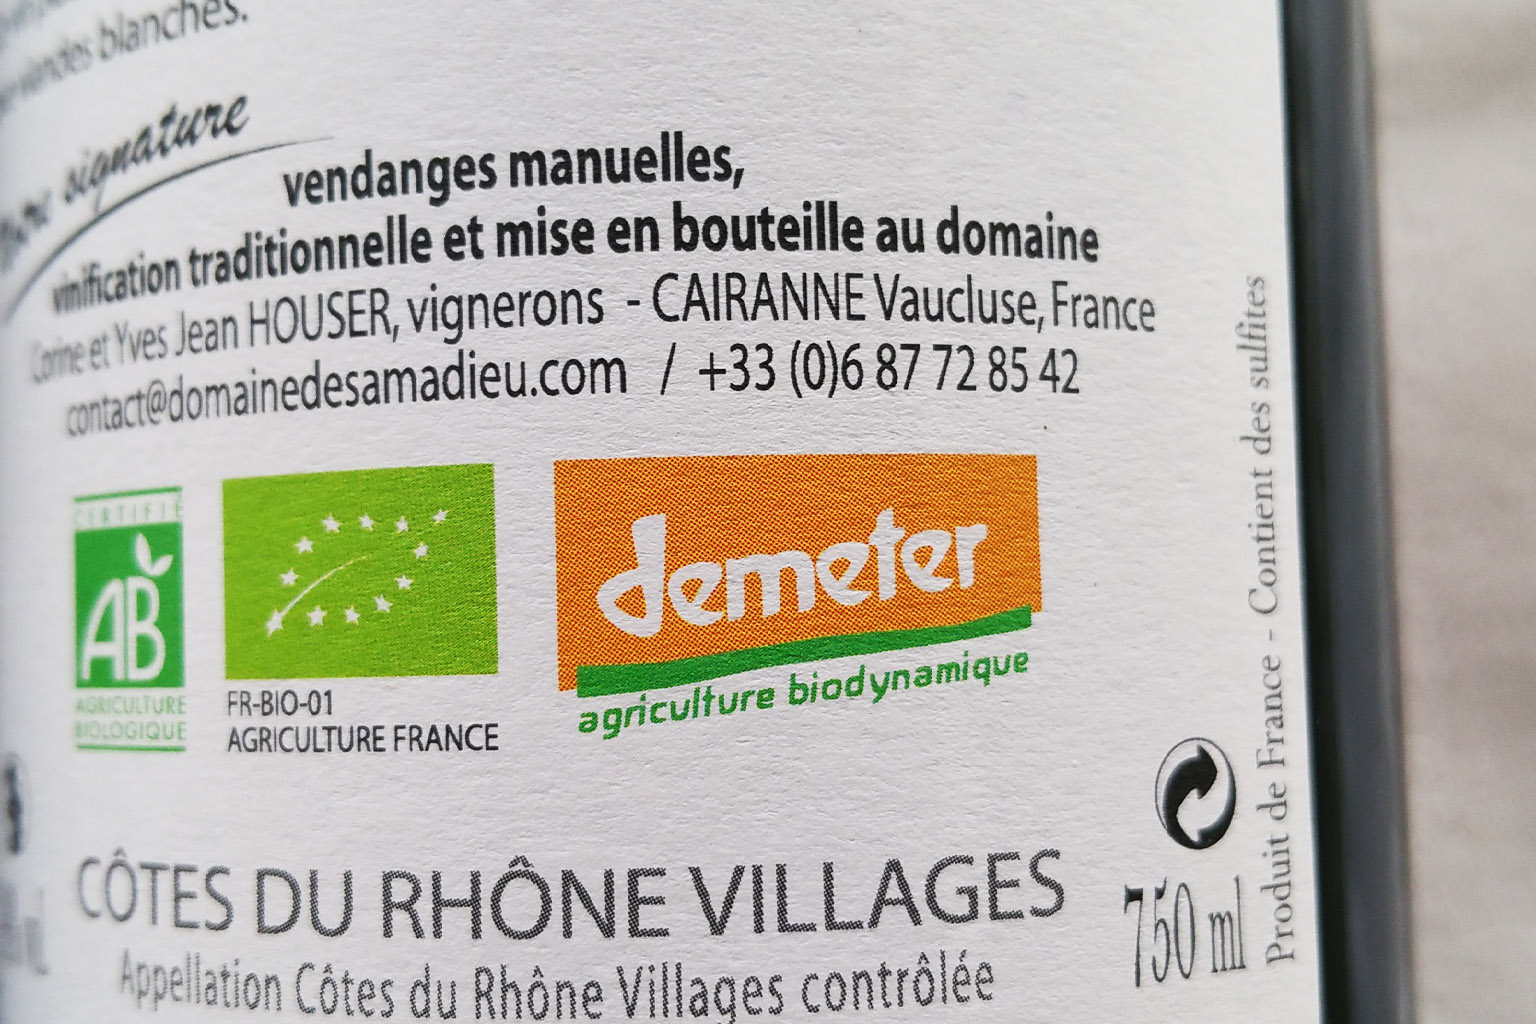 Biodynamie - アペロ ワインバー / apéro WINEBAR - vins et petits plats français - Minami Aoyama Tokyo